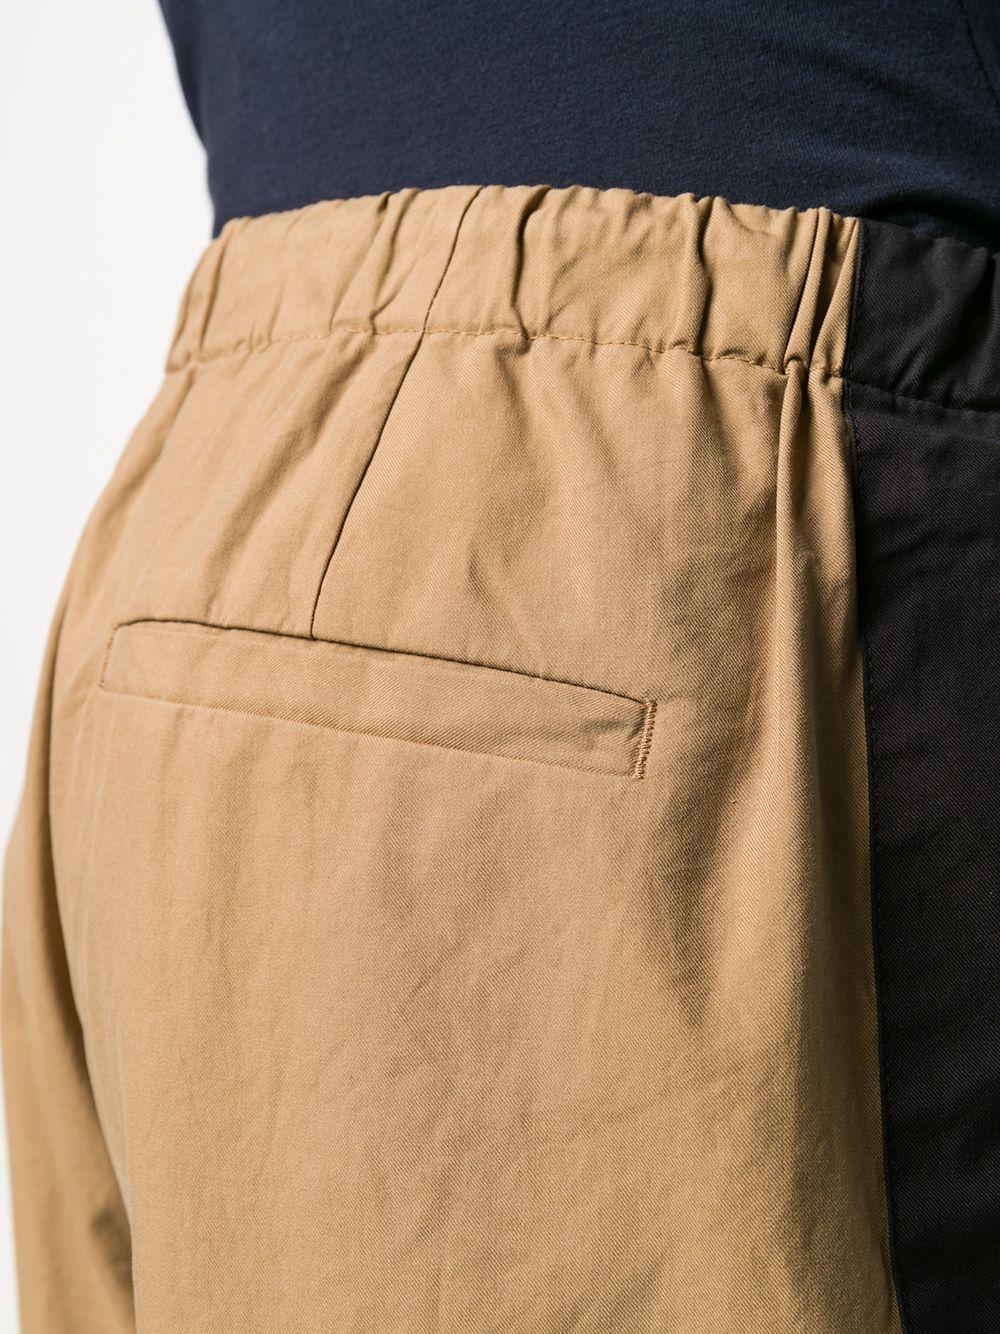 DRIES VAN NOTEN Trousers DRIES VAN NOTEN | Trousers | 201209279022102